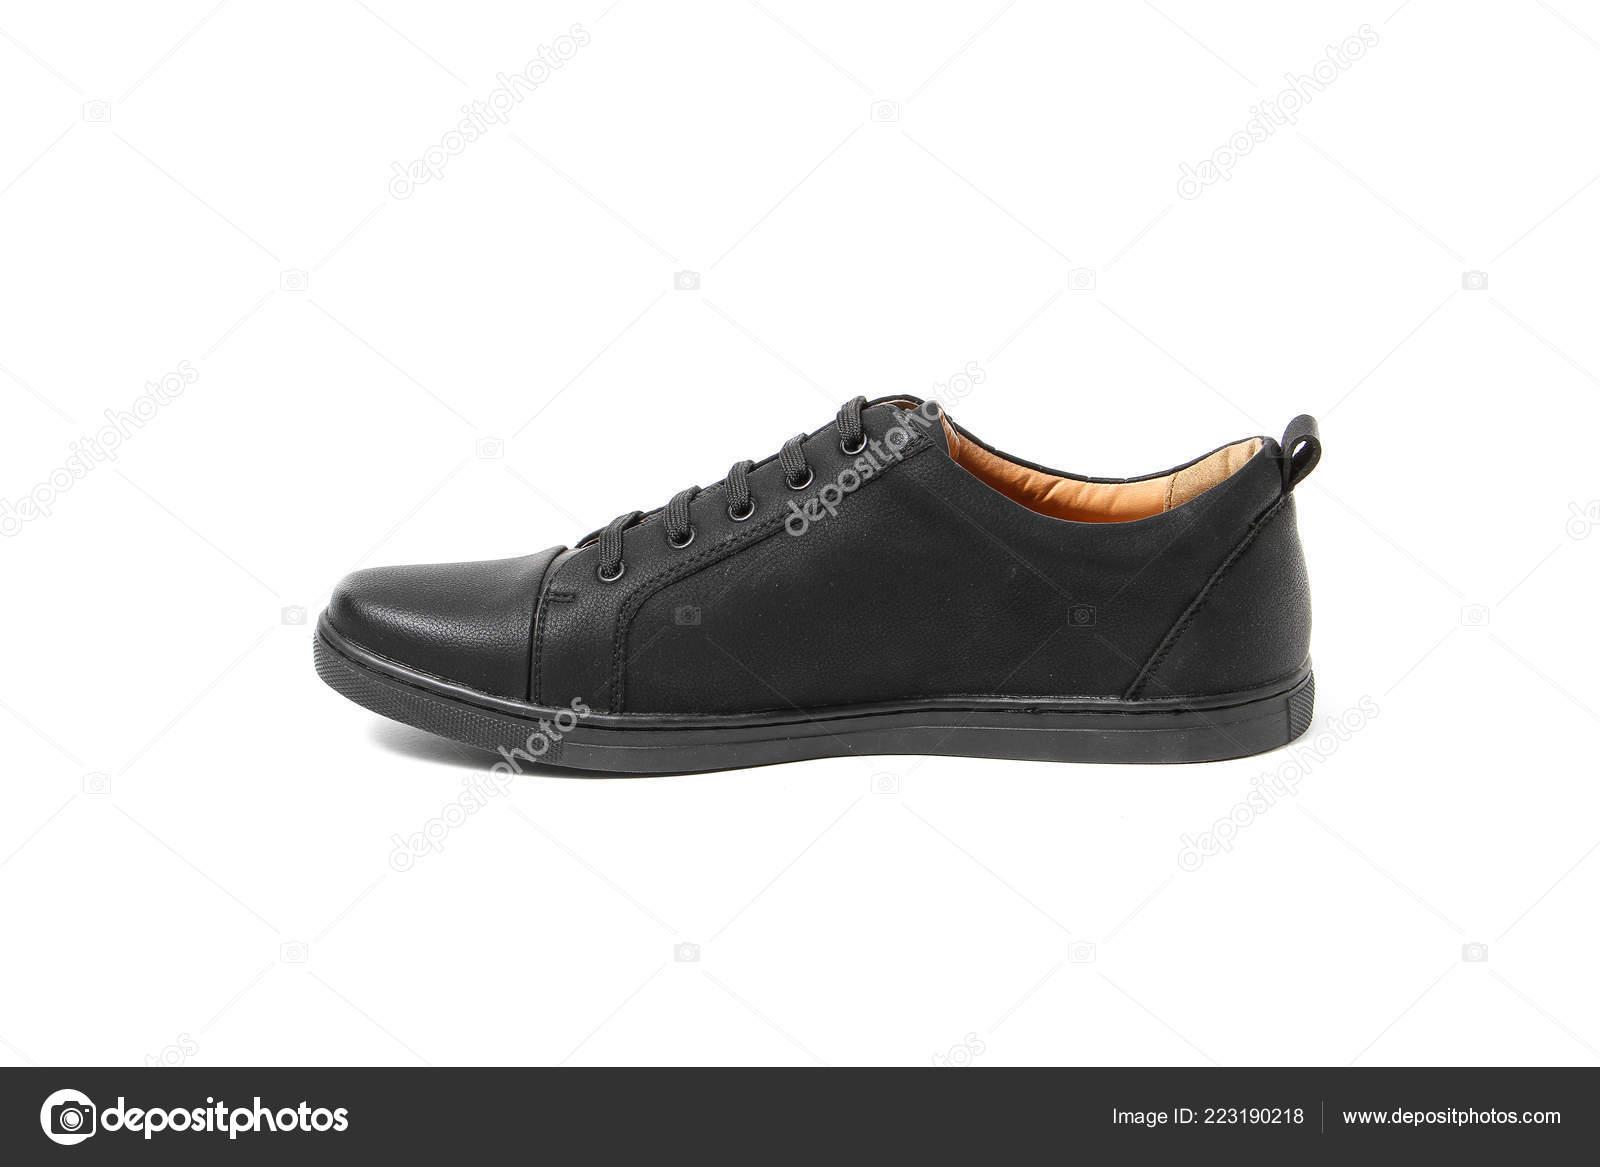 8e2424a8f7e Γραφείο Δέρματα Άνθρωπος Παπούτσια Που Απομονώνονται Λευκό– εικόνα αρχείου